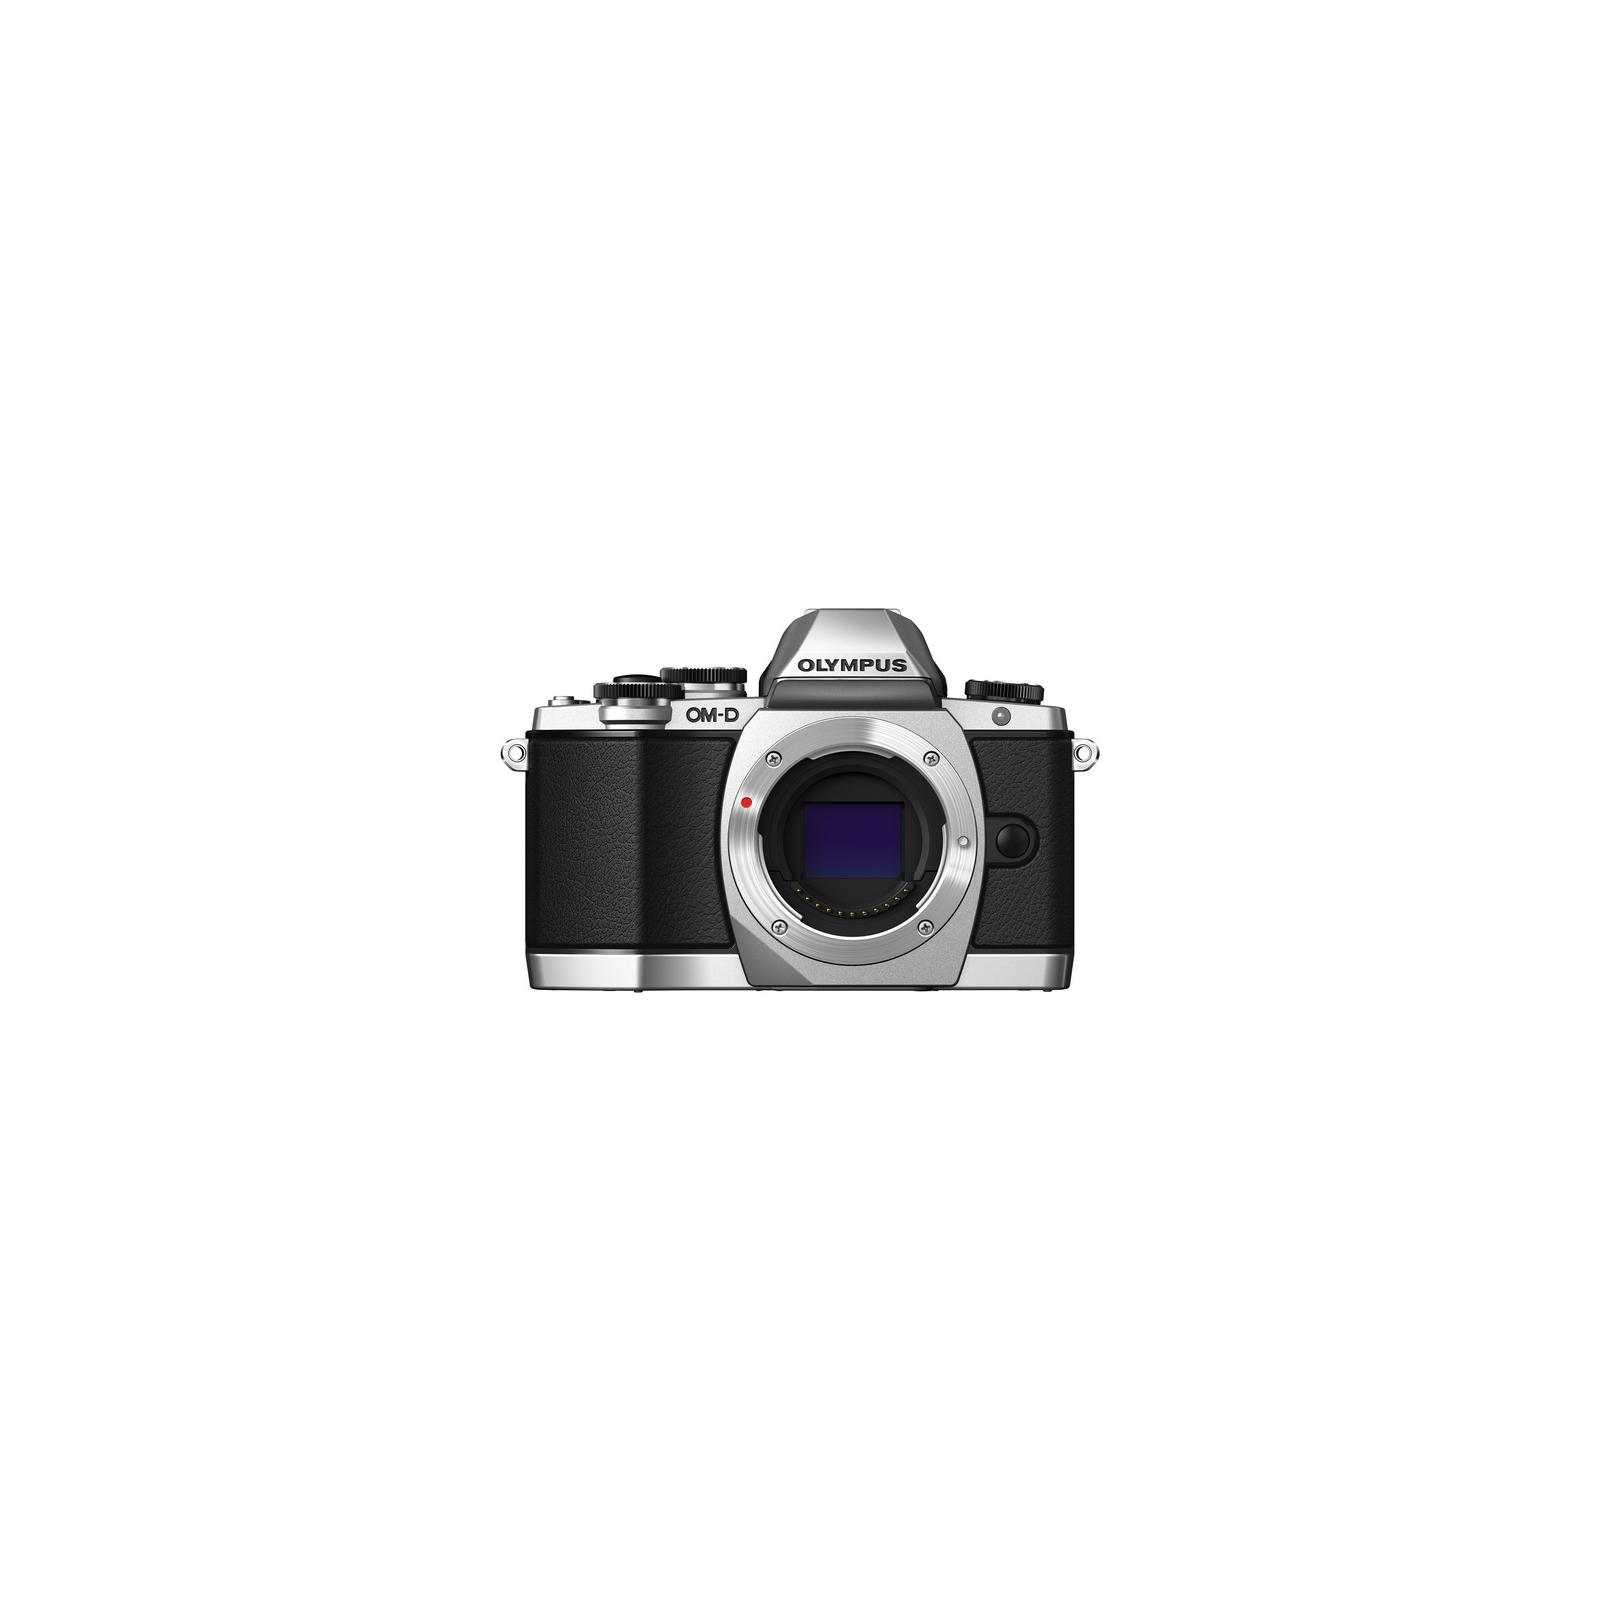 Цифровой фотоаппарат OLYMPUS E-M10 14-42 Kit silver/black (V207021SE000) изображение 2